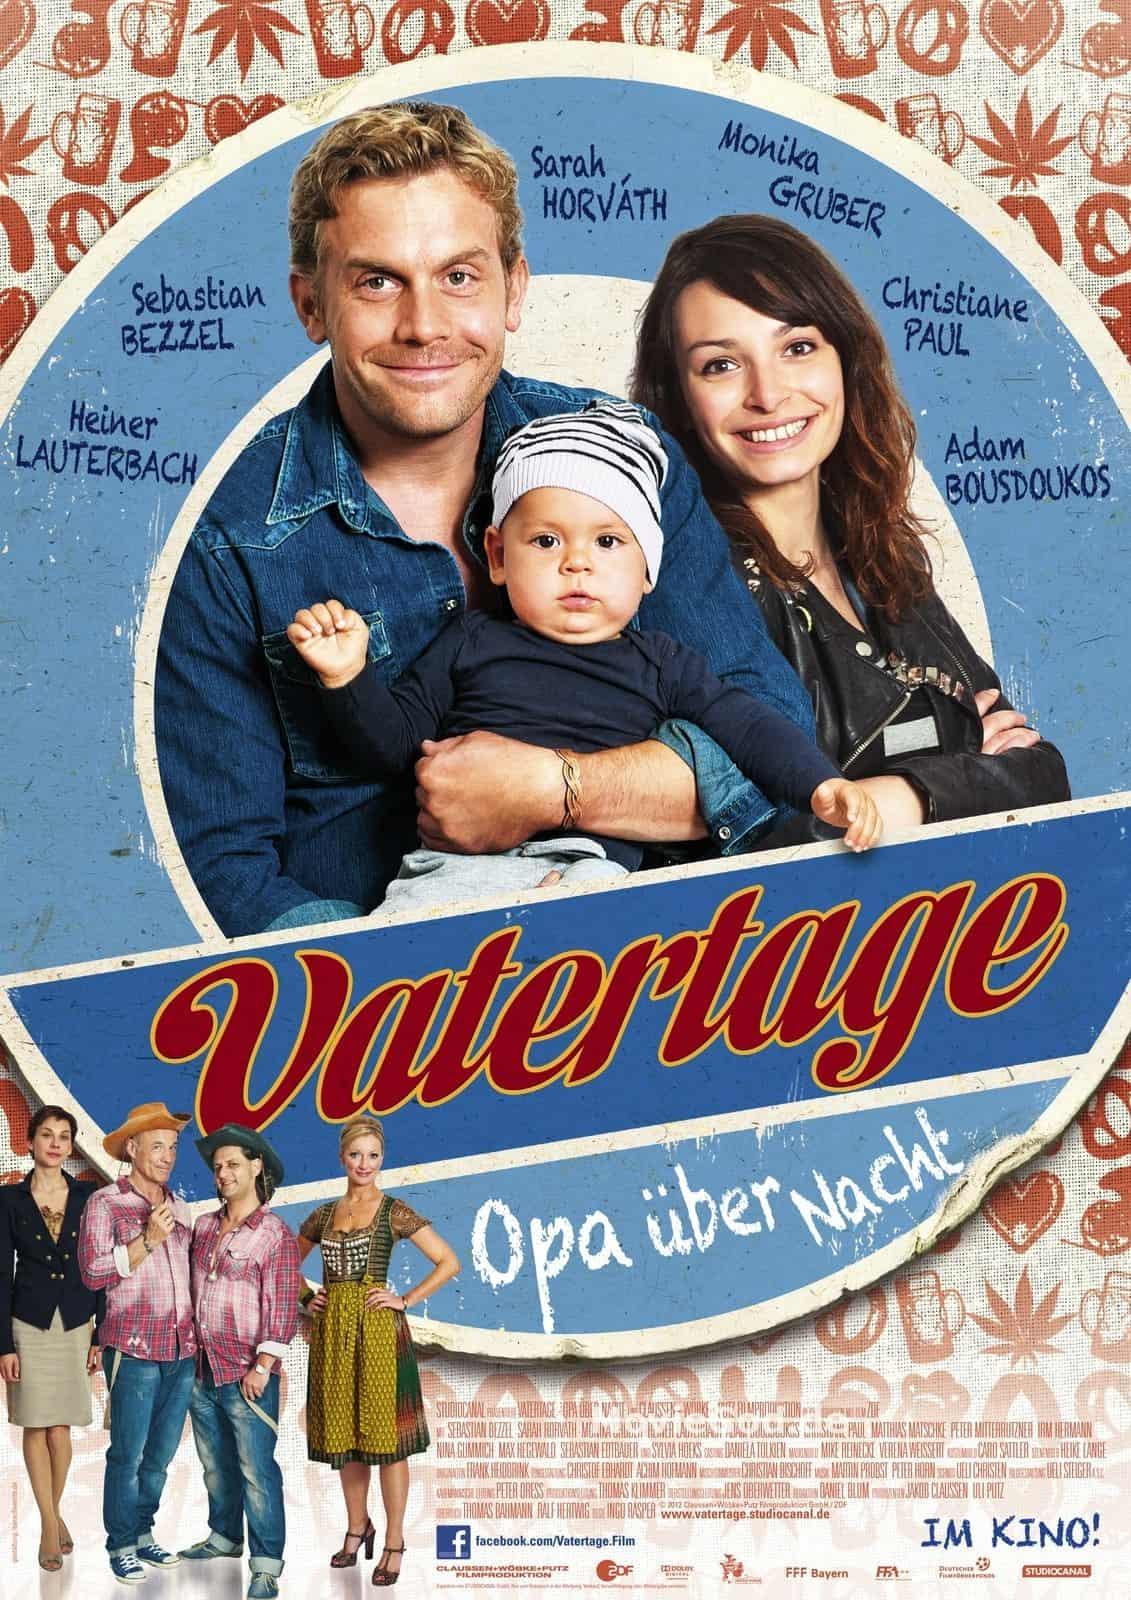 Vatertage - Opa uber Nacht, 2012